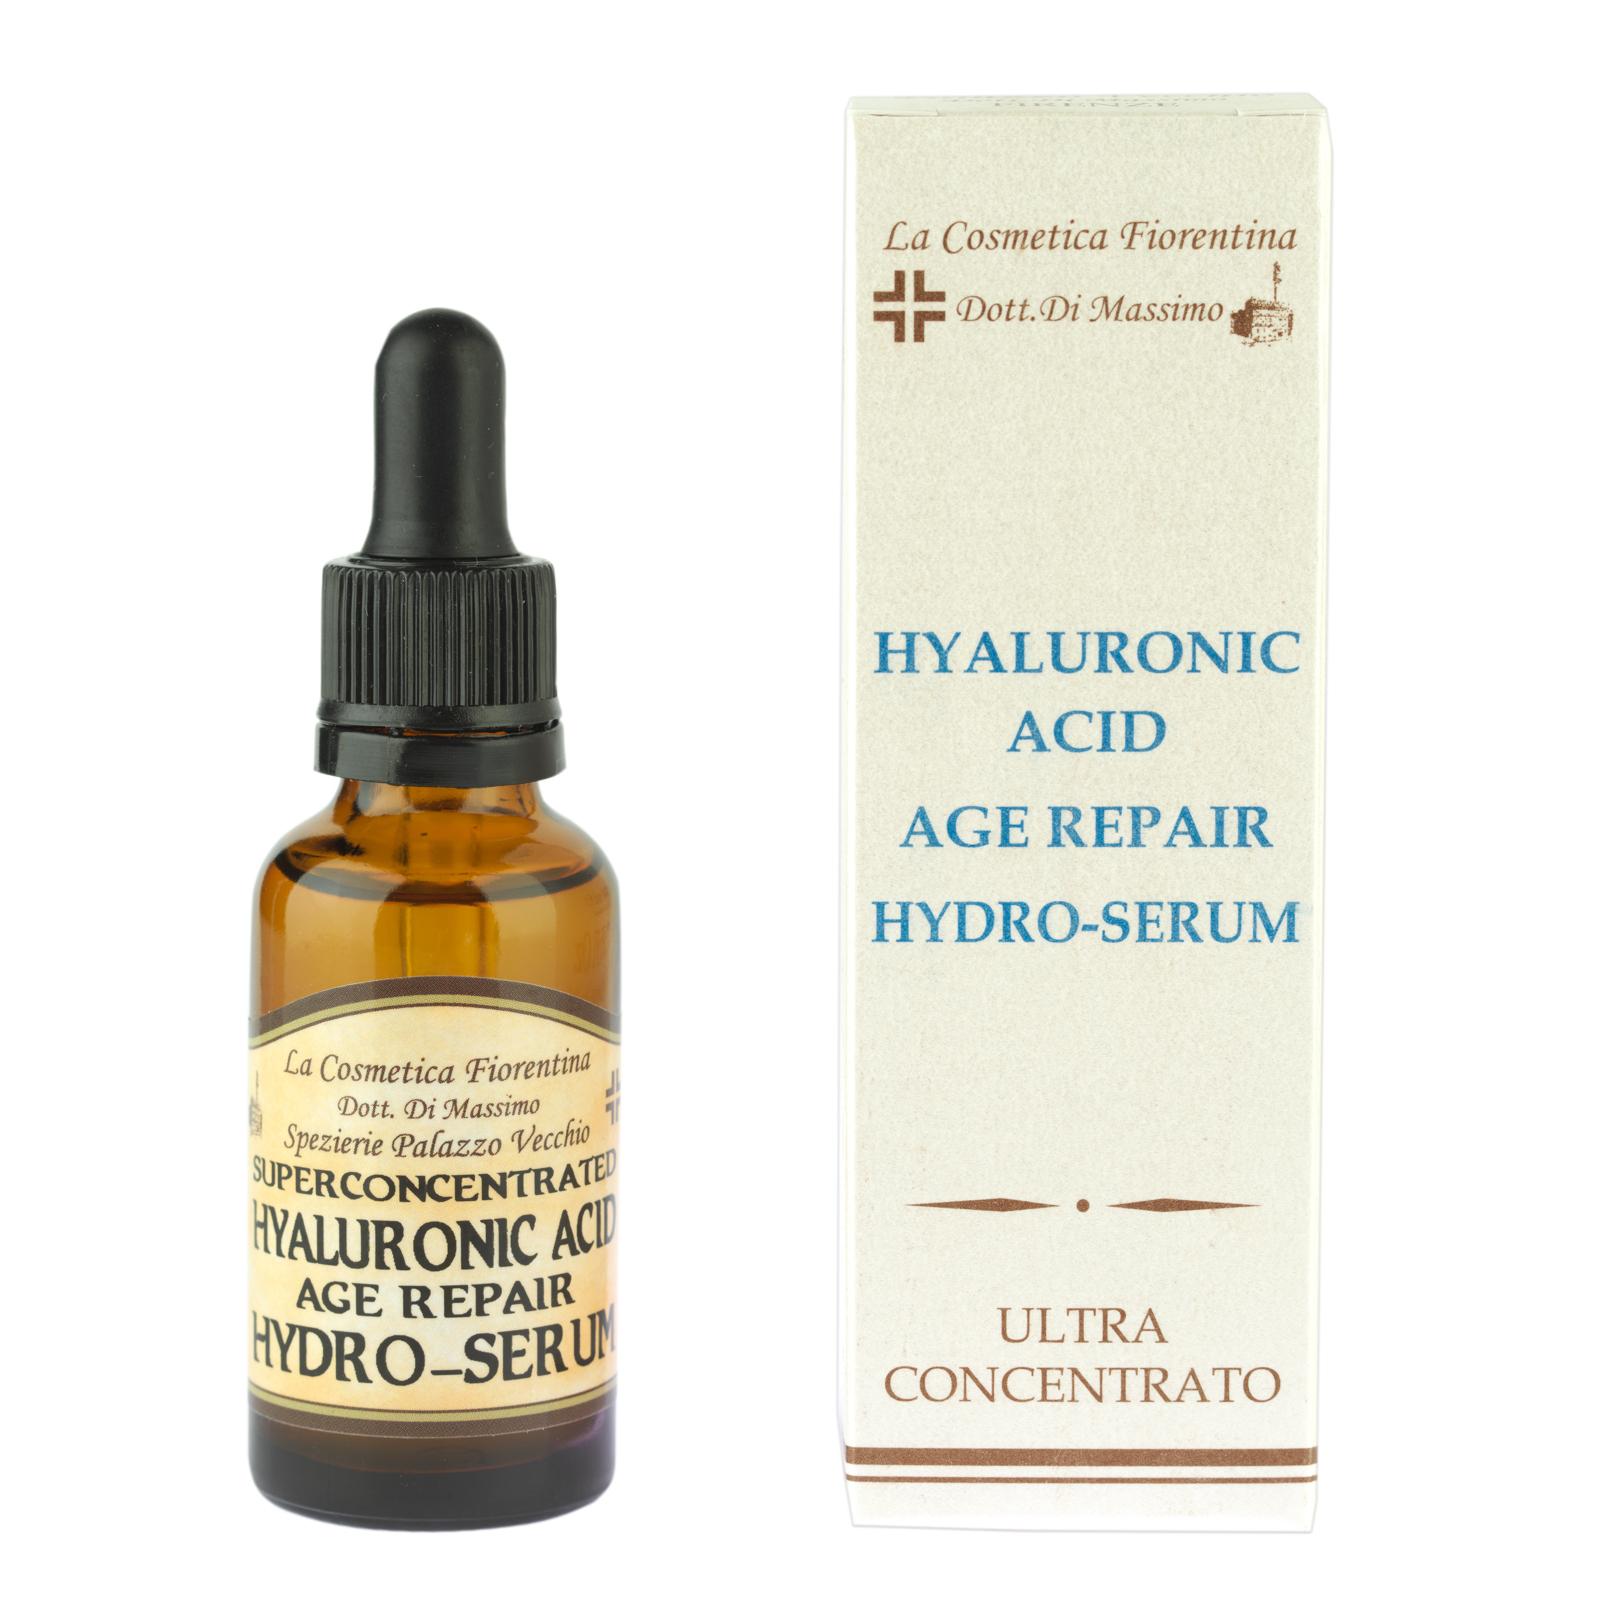 HYALURONIC ACID AGE REPAIR HYDRO SERUM-0